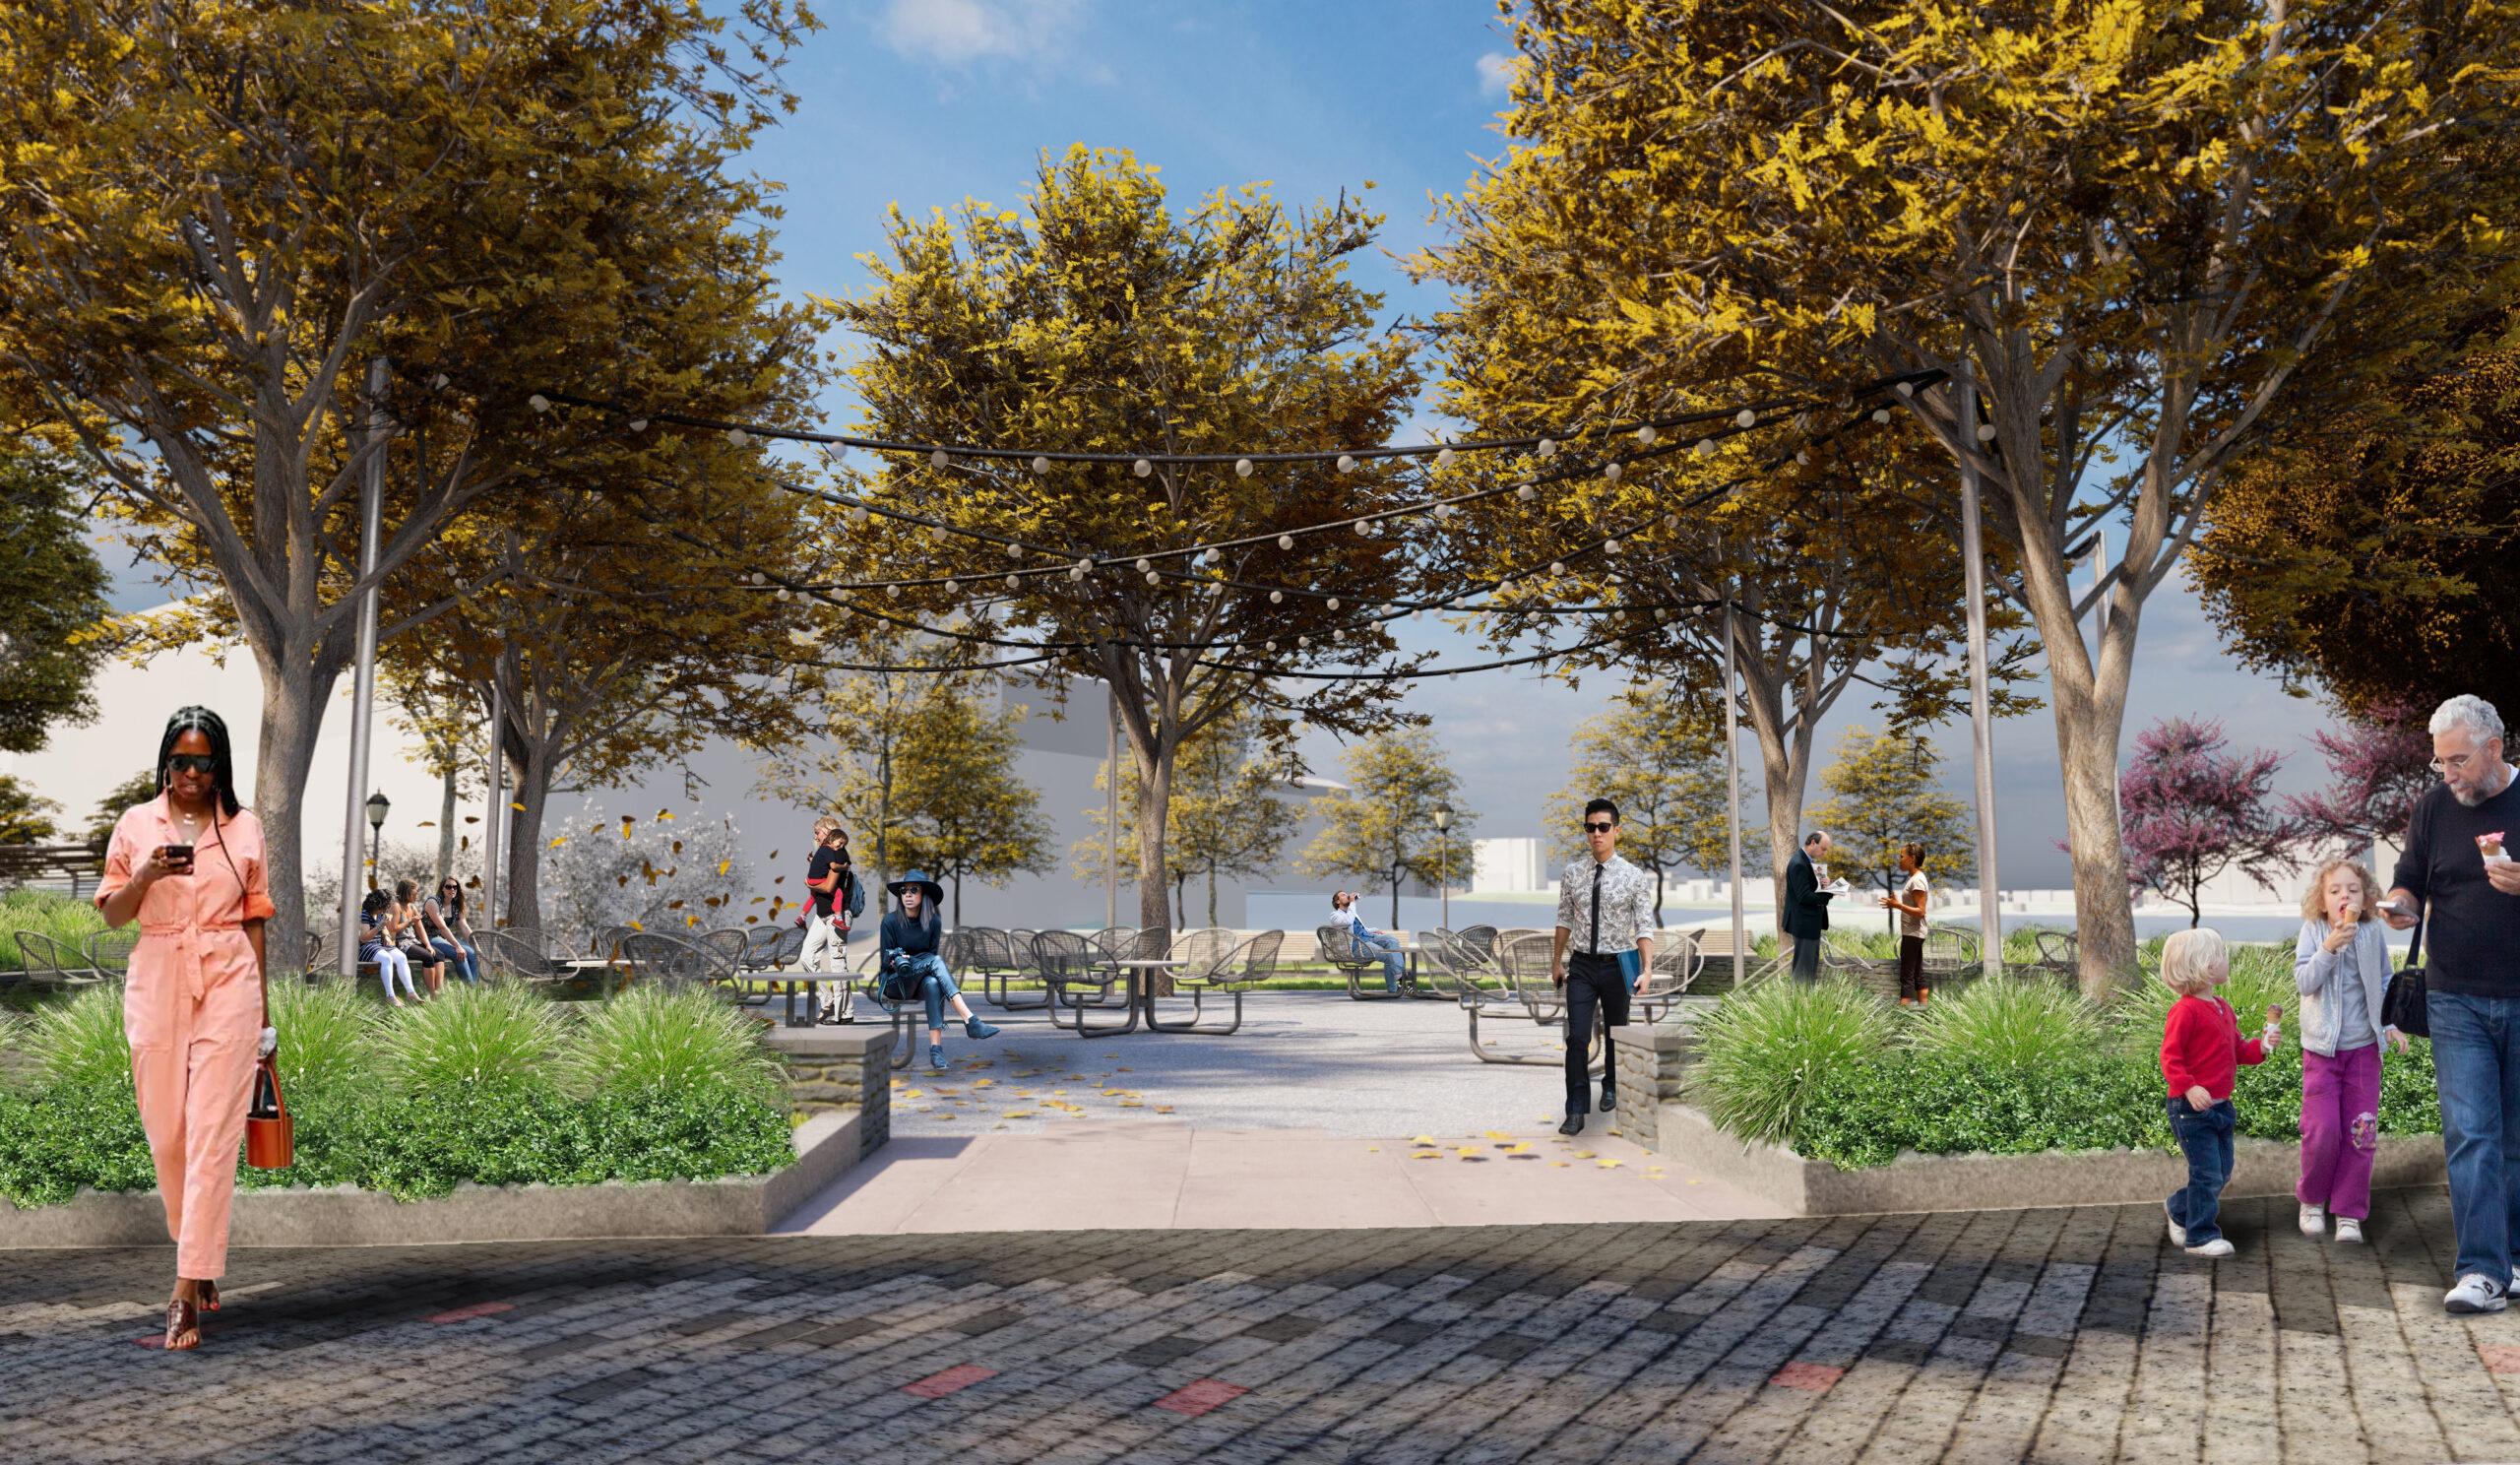 Chelsea Waterside Park picnic area